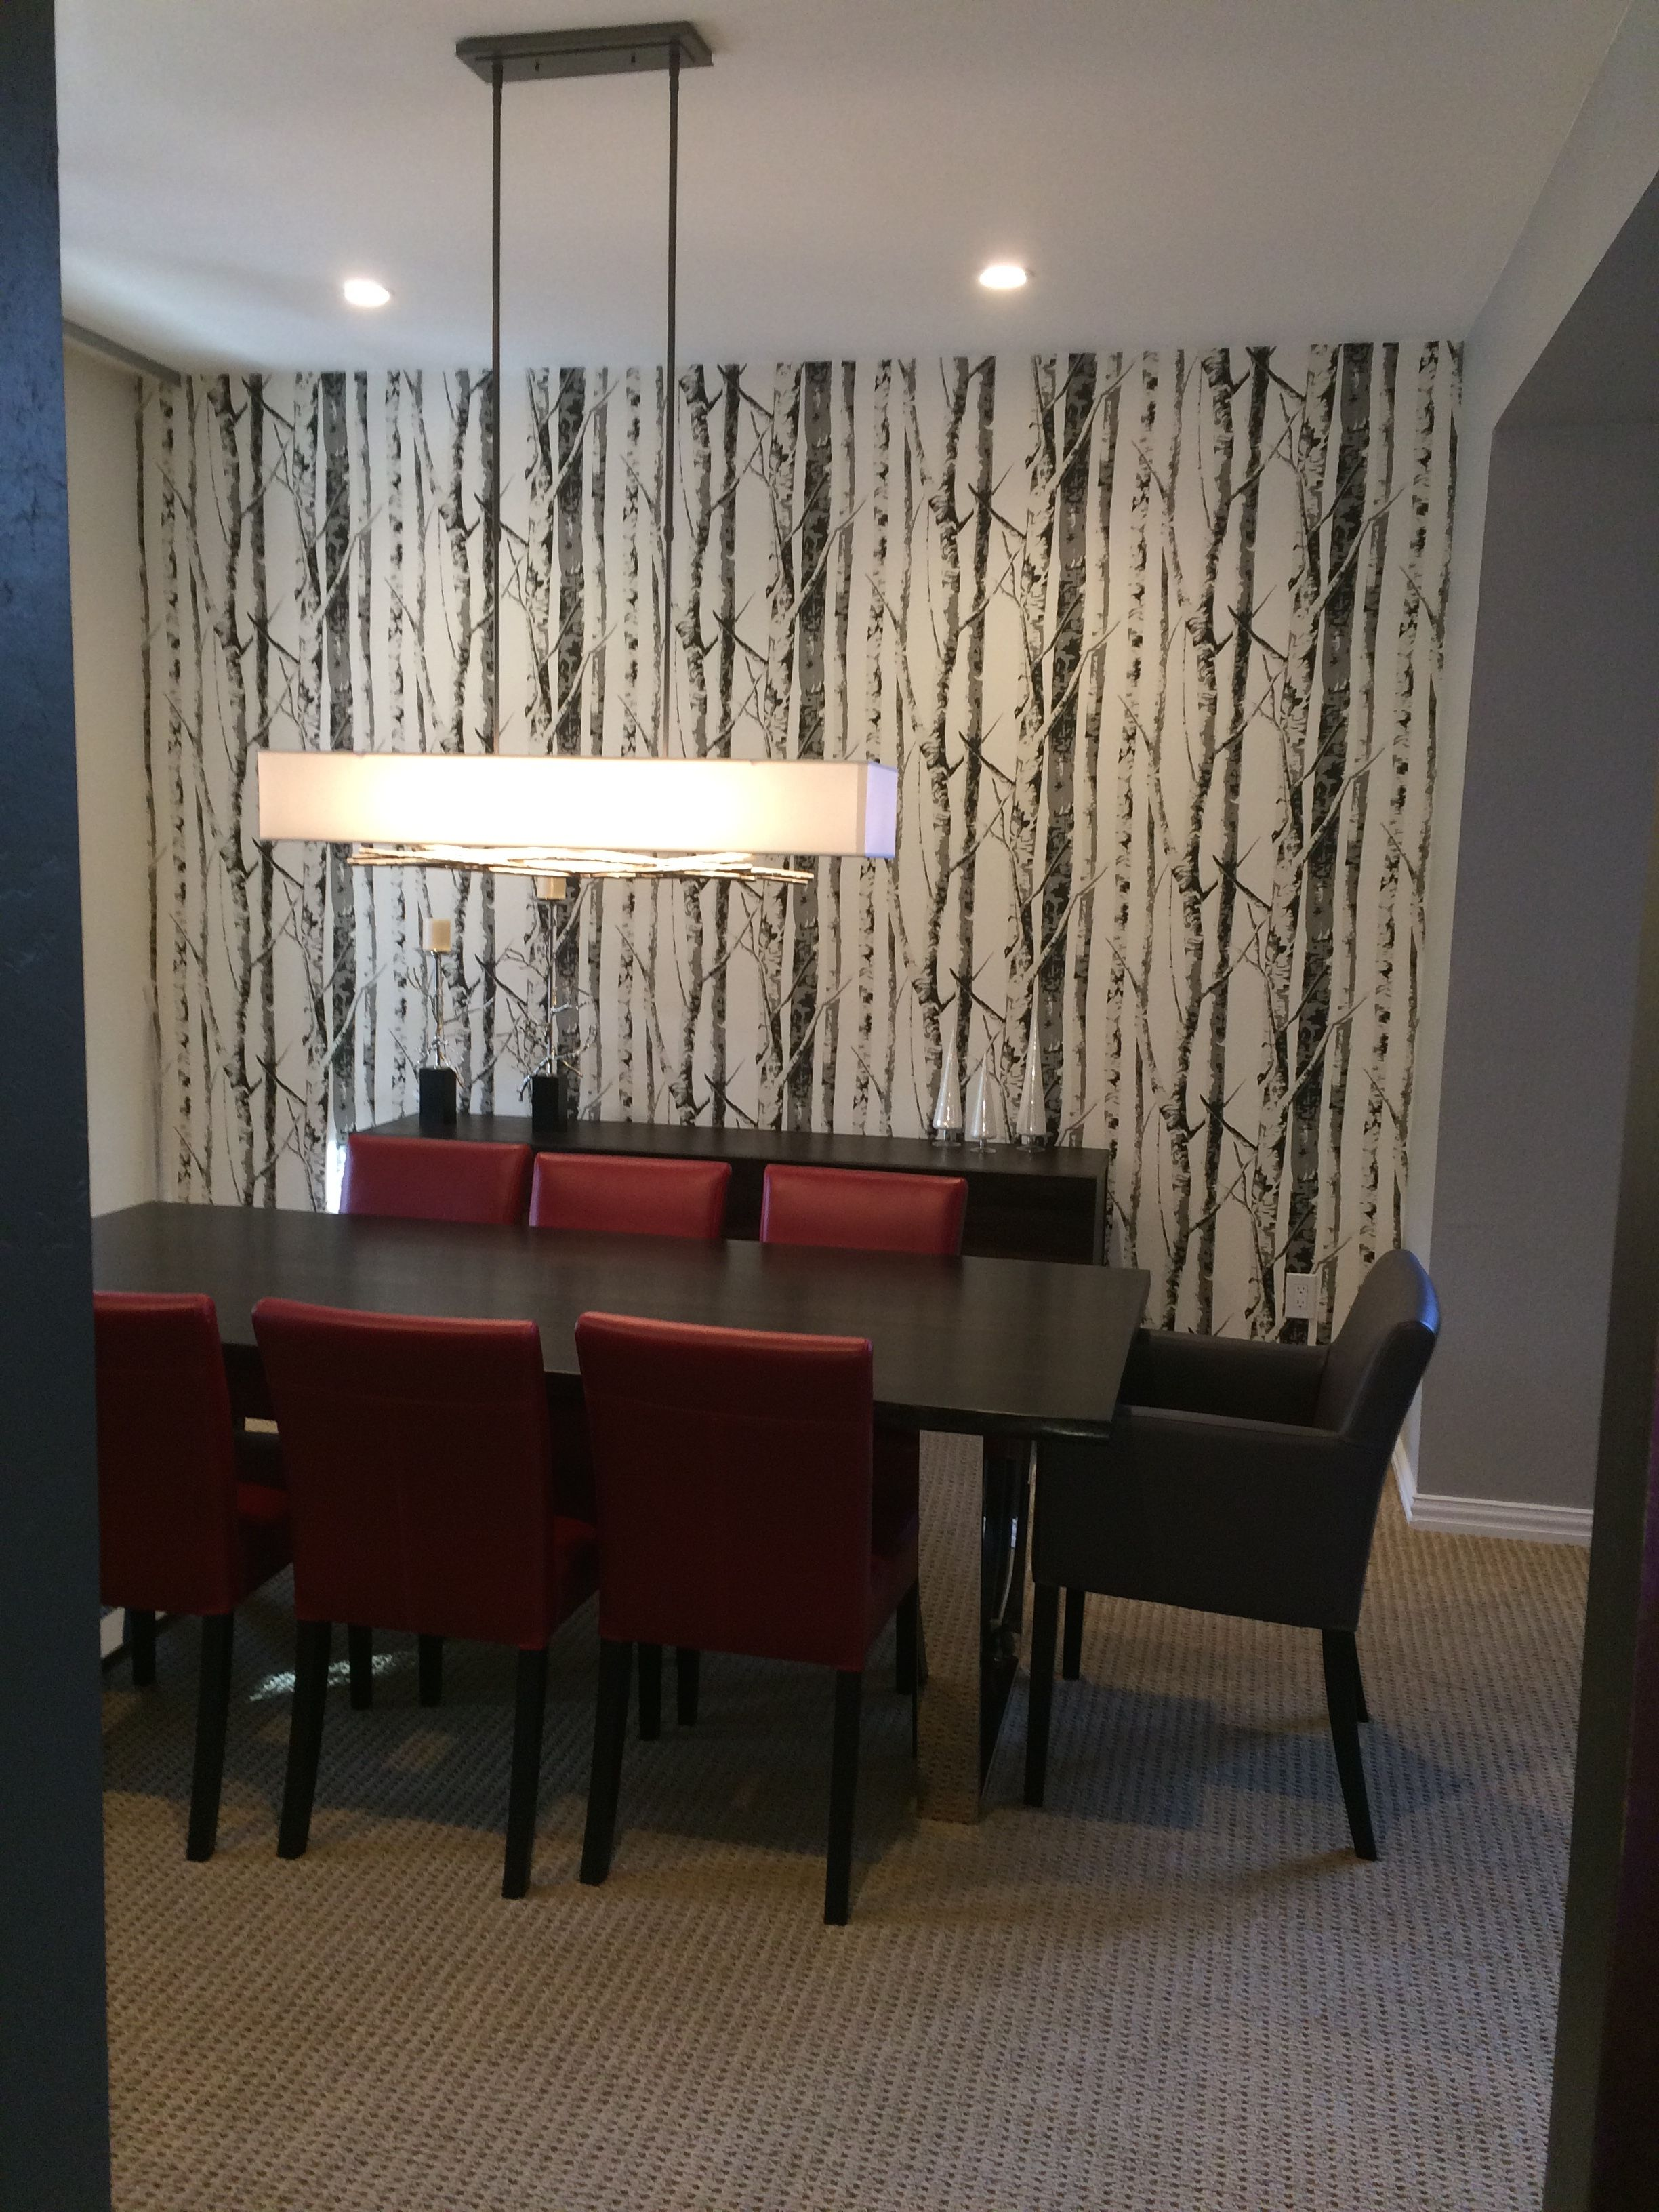 Modern Dining Room With Aspen Tree (Silver Birch) Wallpaper